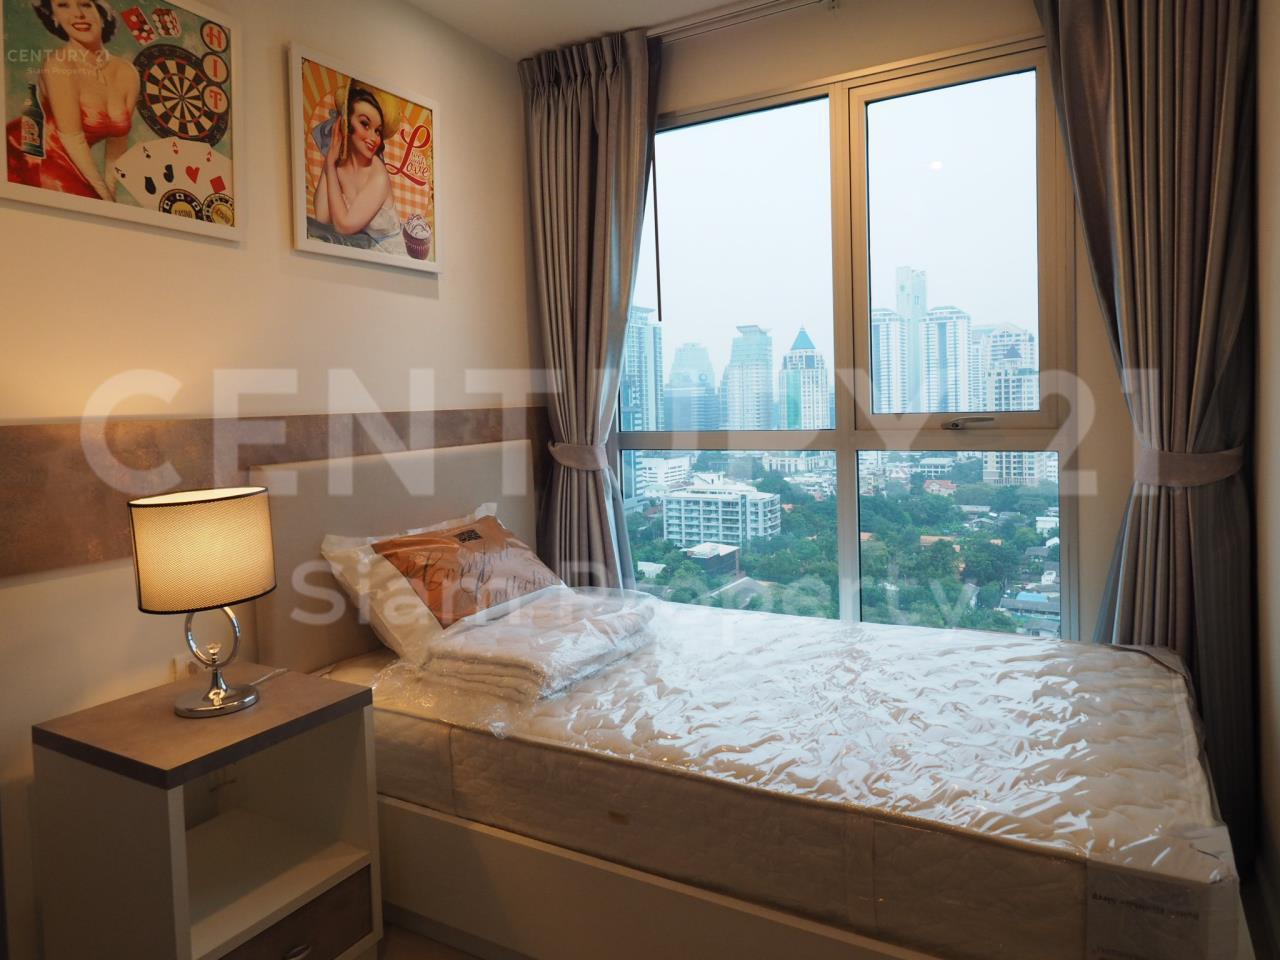 Century21 Siam Property Agency's Rhythm Sathorn - Narathiwas 2